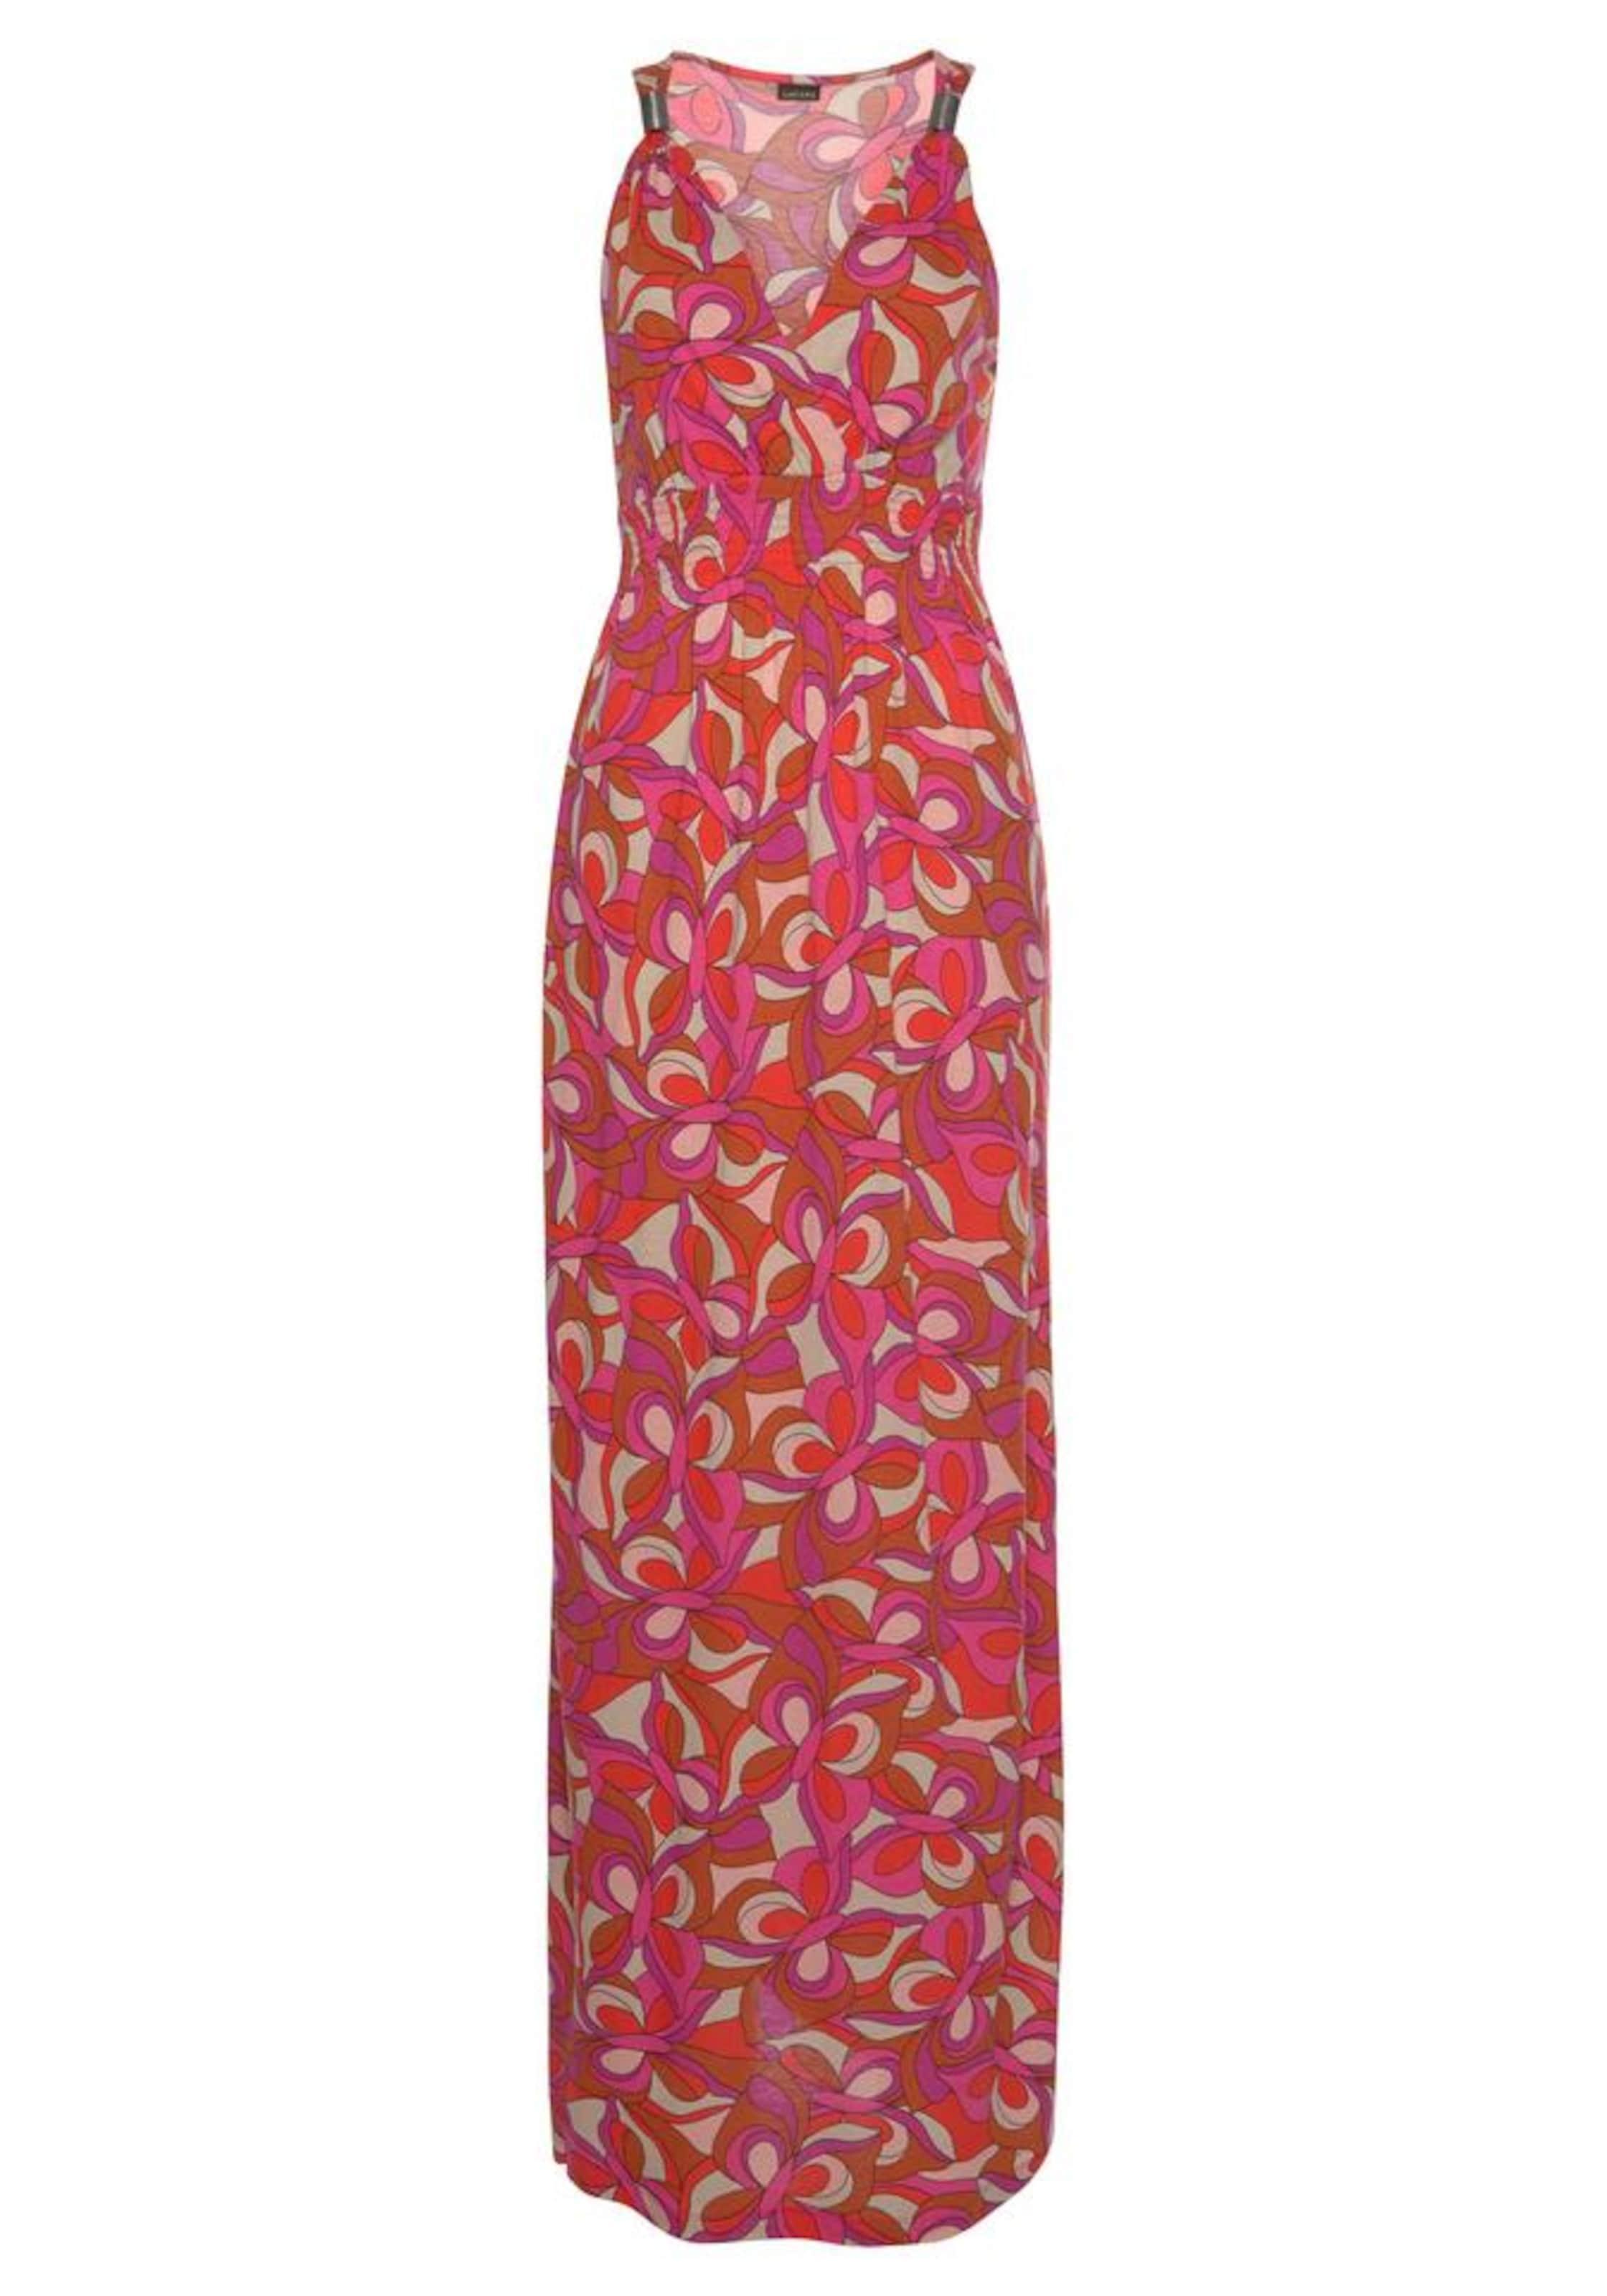 In Kleid MischfarbenRot In Kleid Lascana Lascana MischfarbenRot In Lascana Kleid MischfarbenRot EDYH9IW2